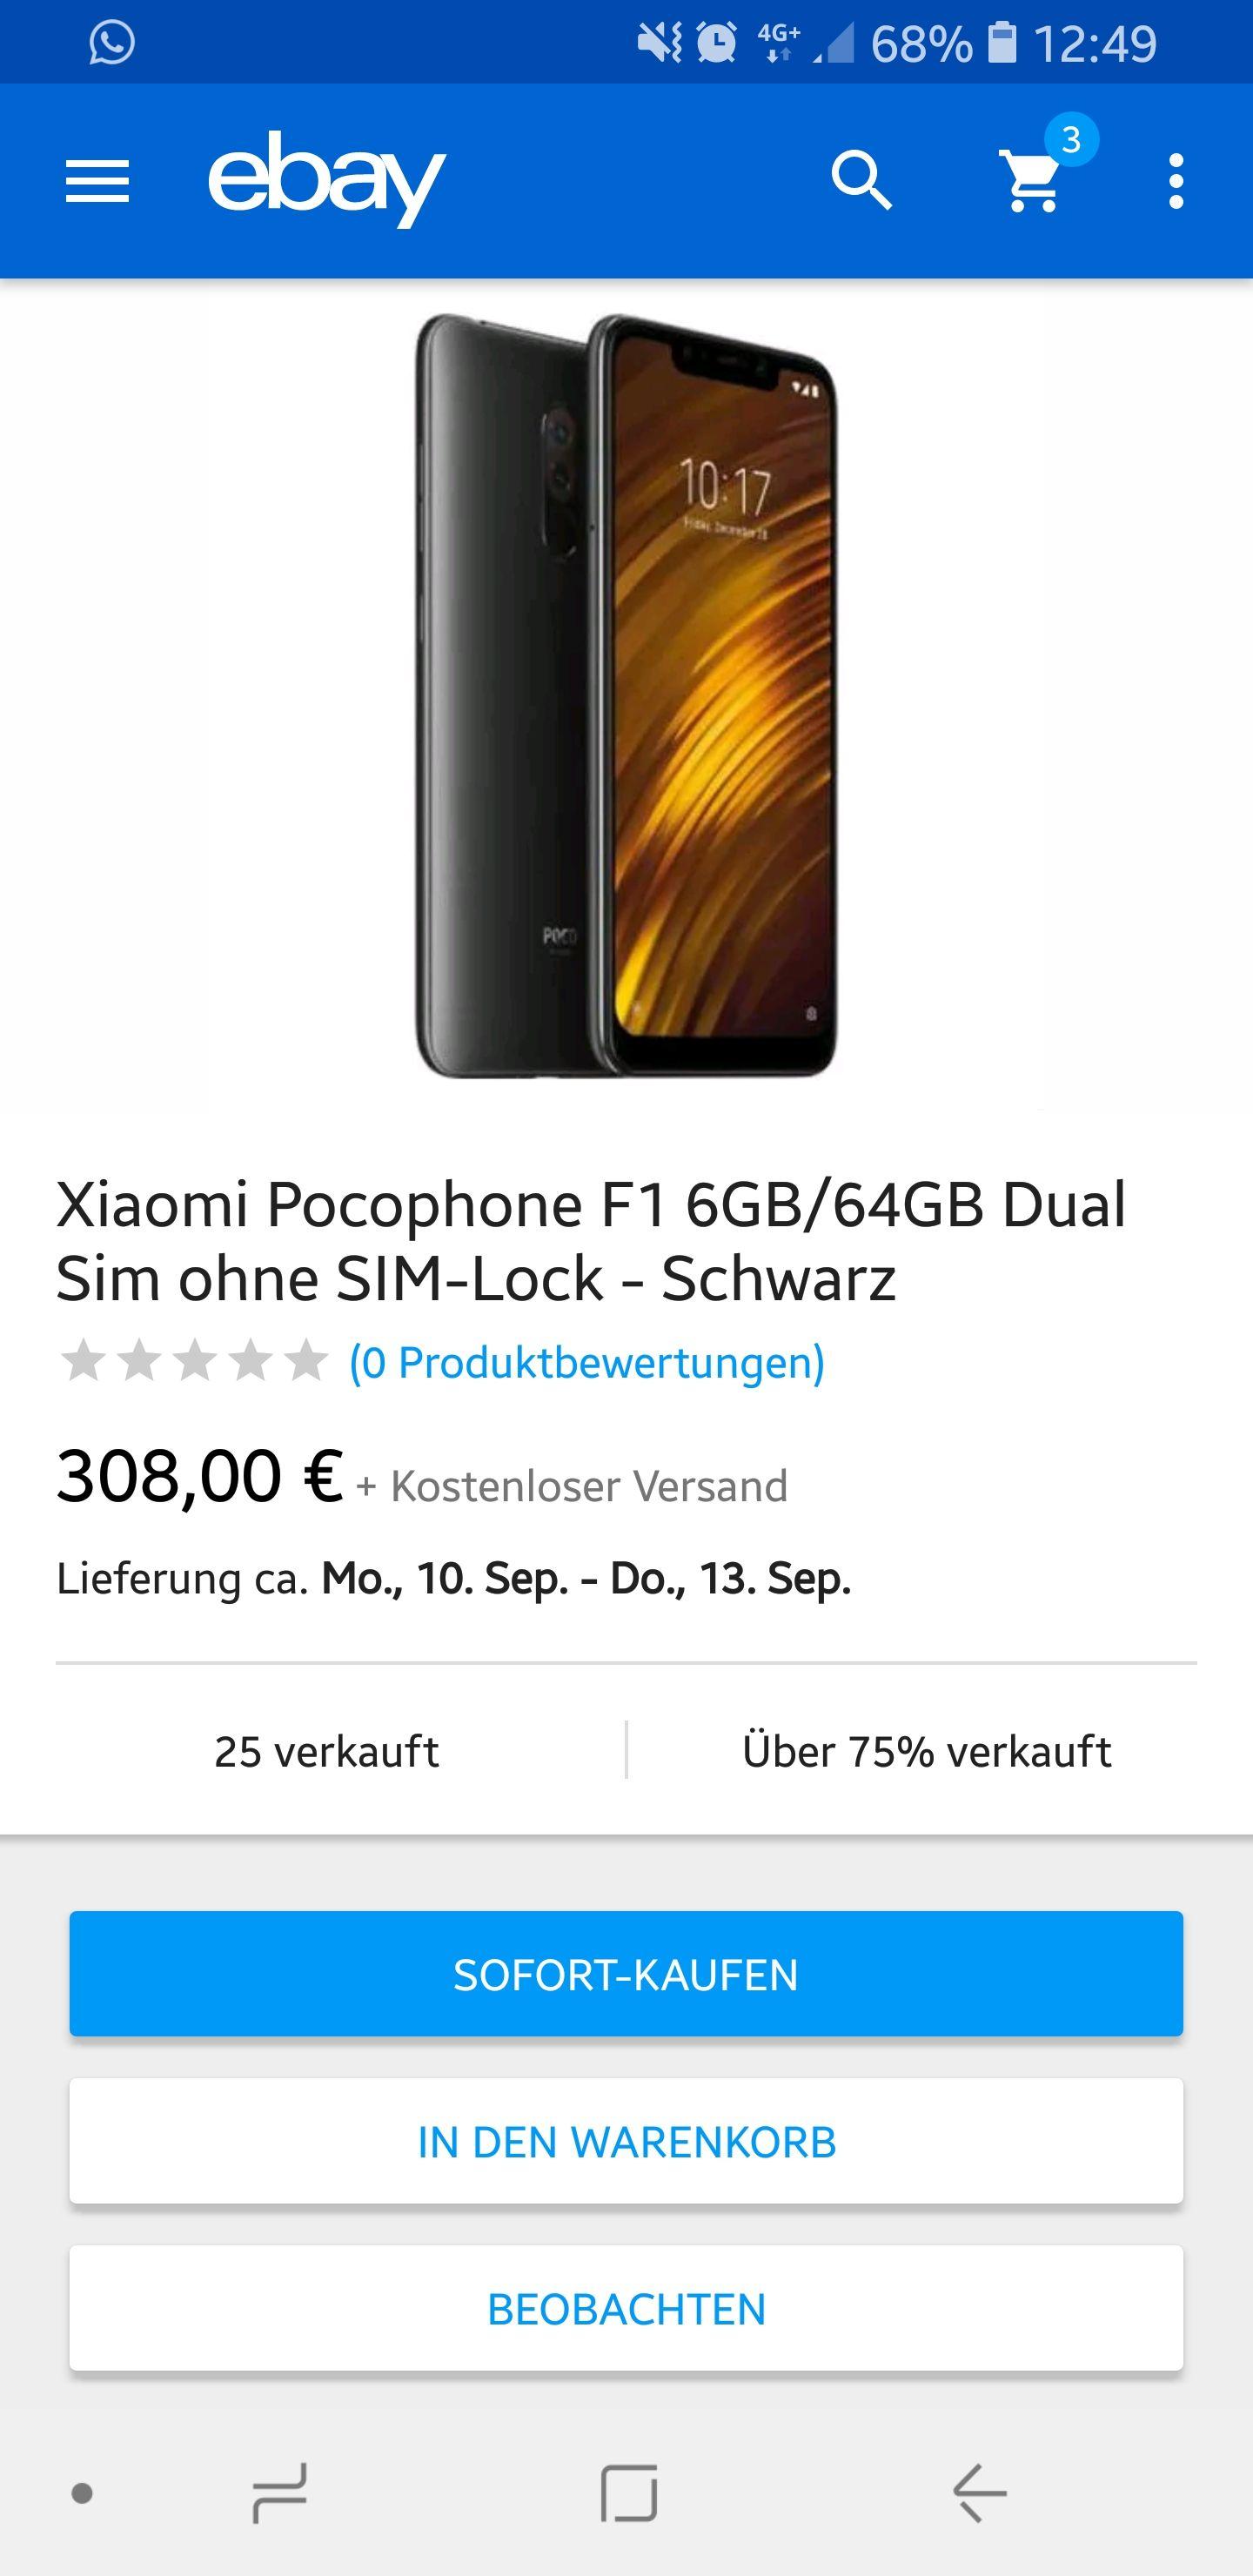 EBAY - Xiaomi pocophone f1 6/64